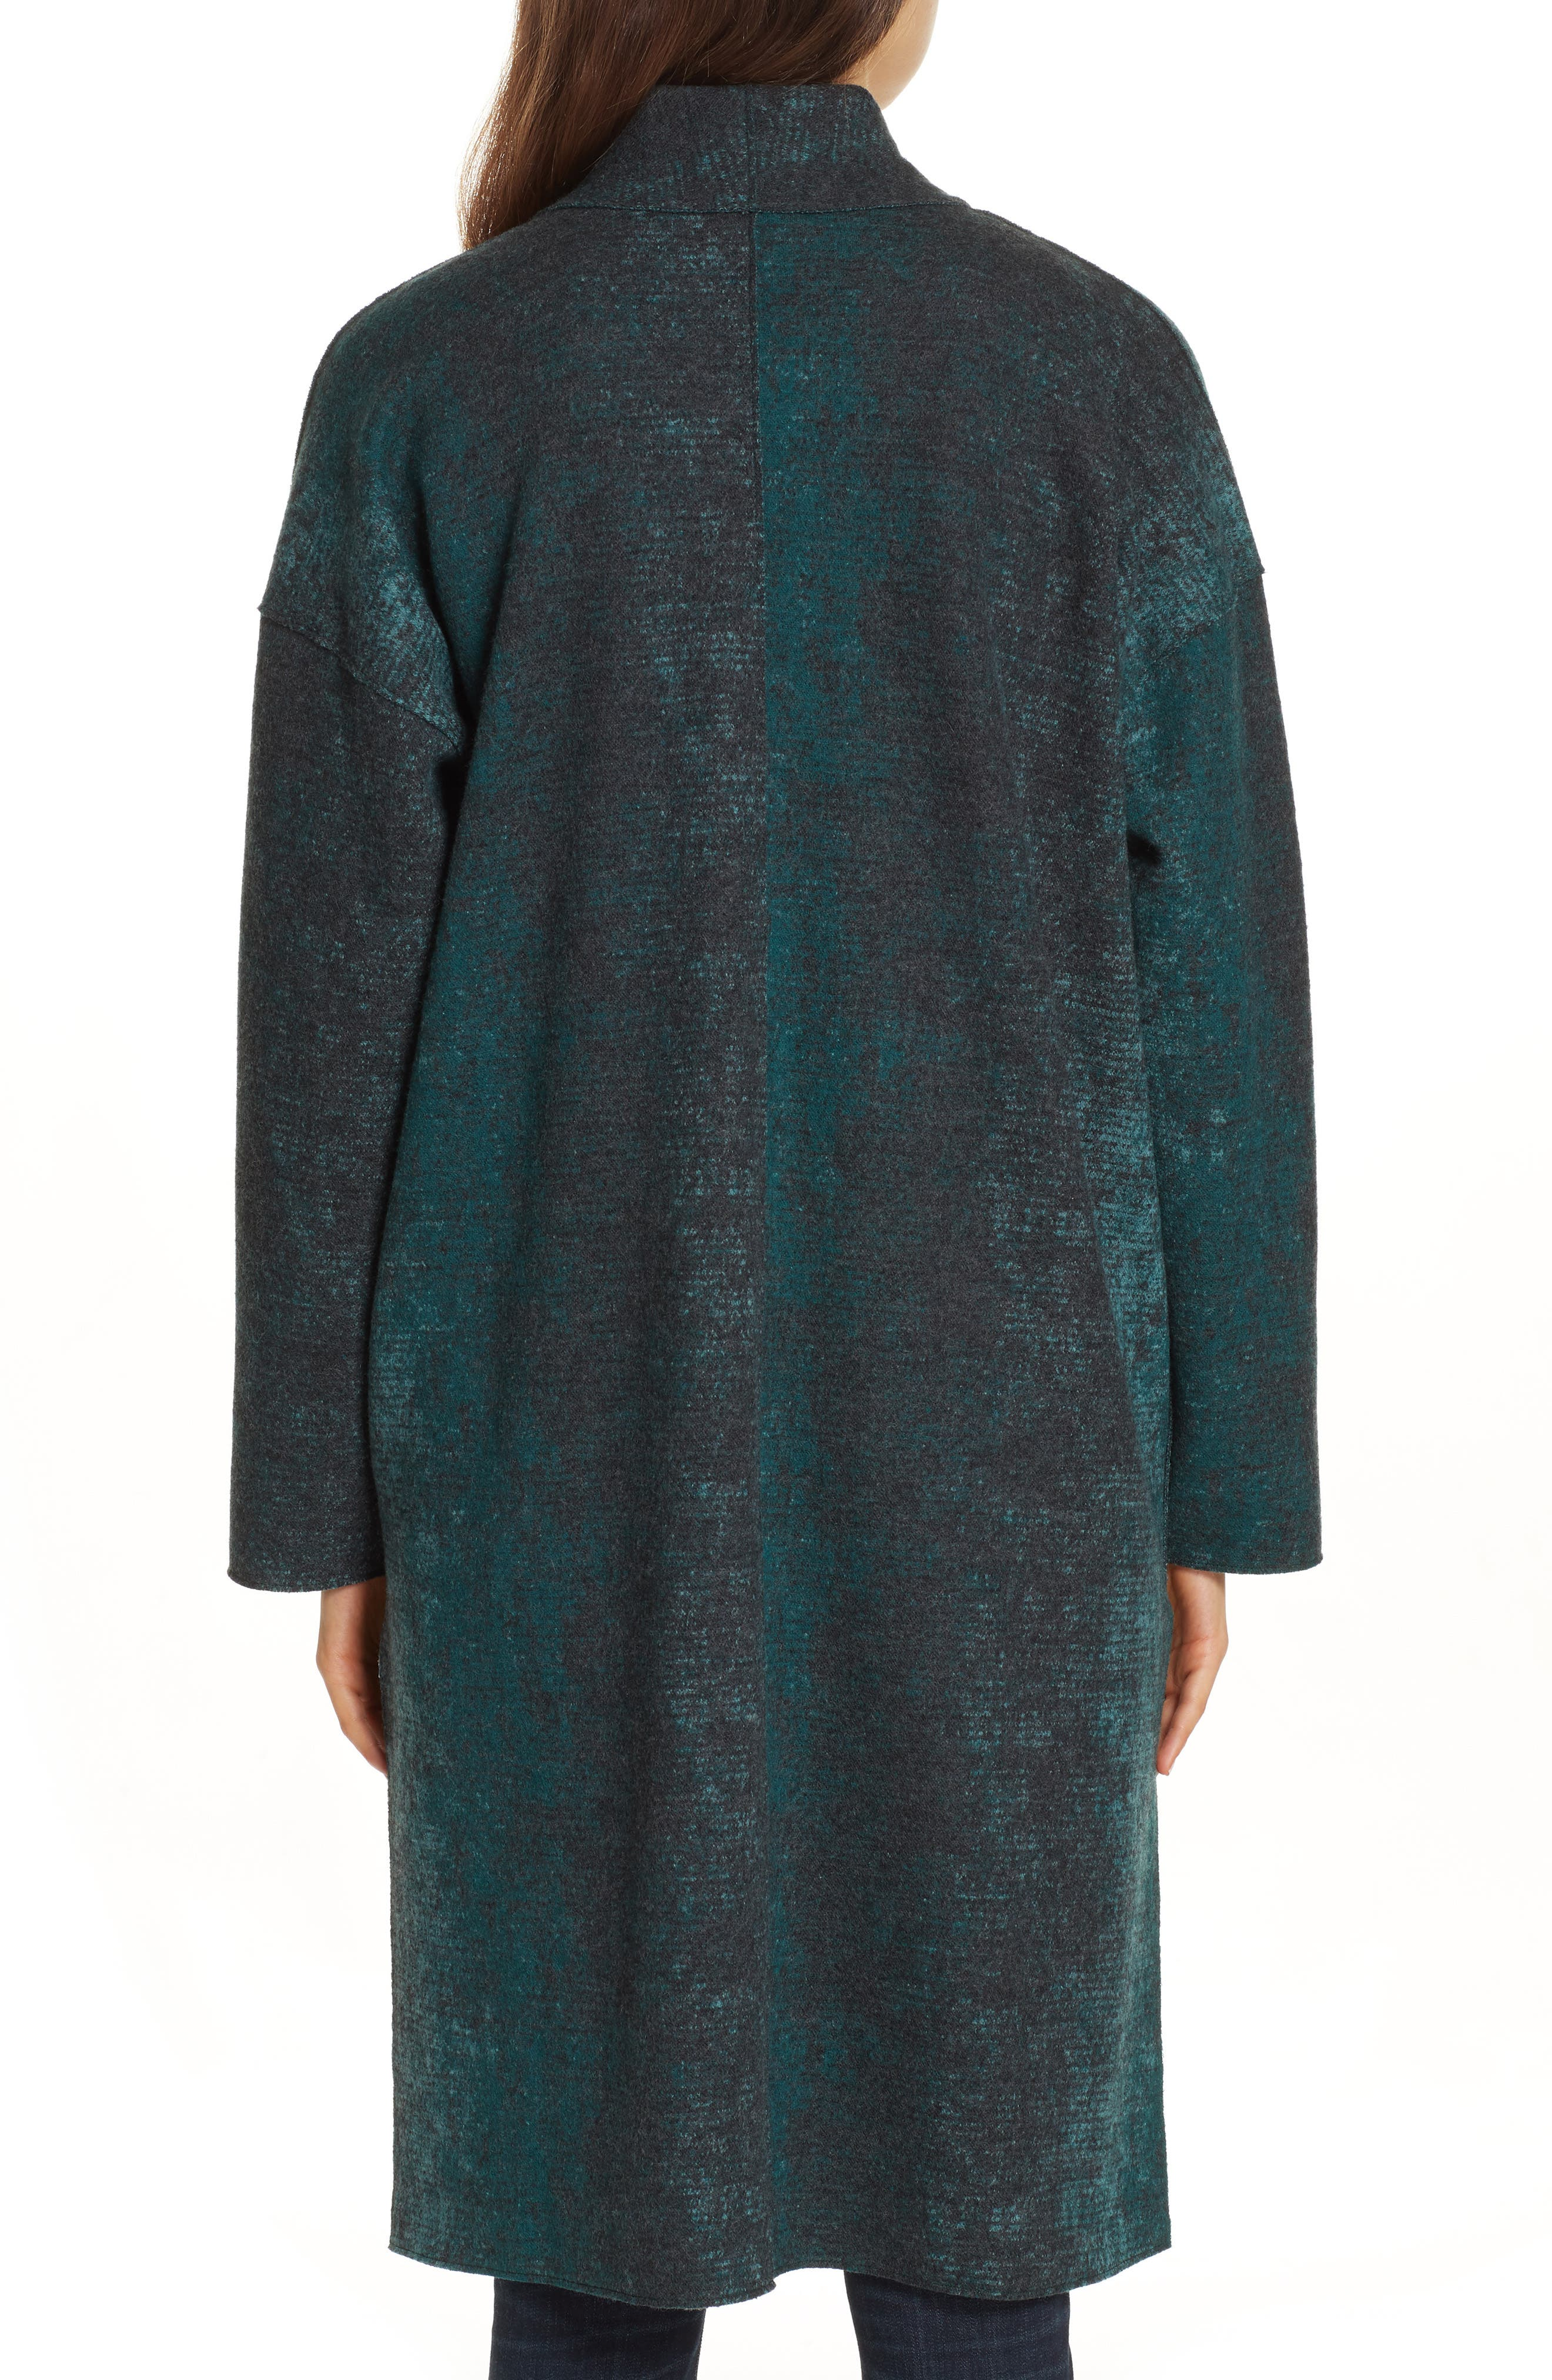 EILEEN FISHER, Wool Blend Kimono Coat, Alternate thumbnail 2, color, PINE